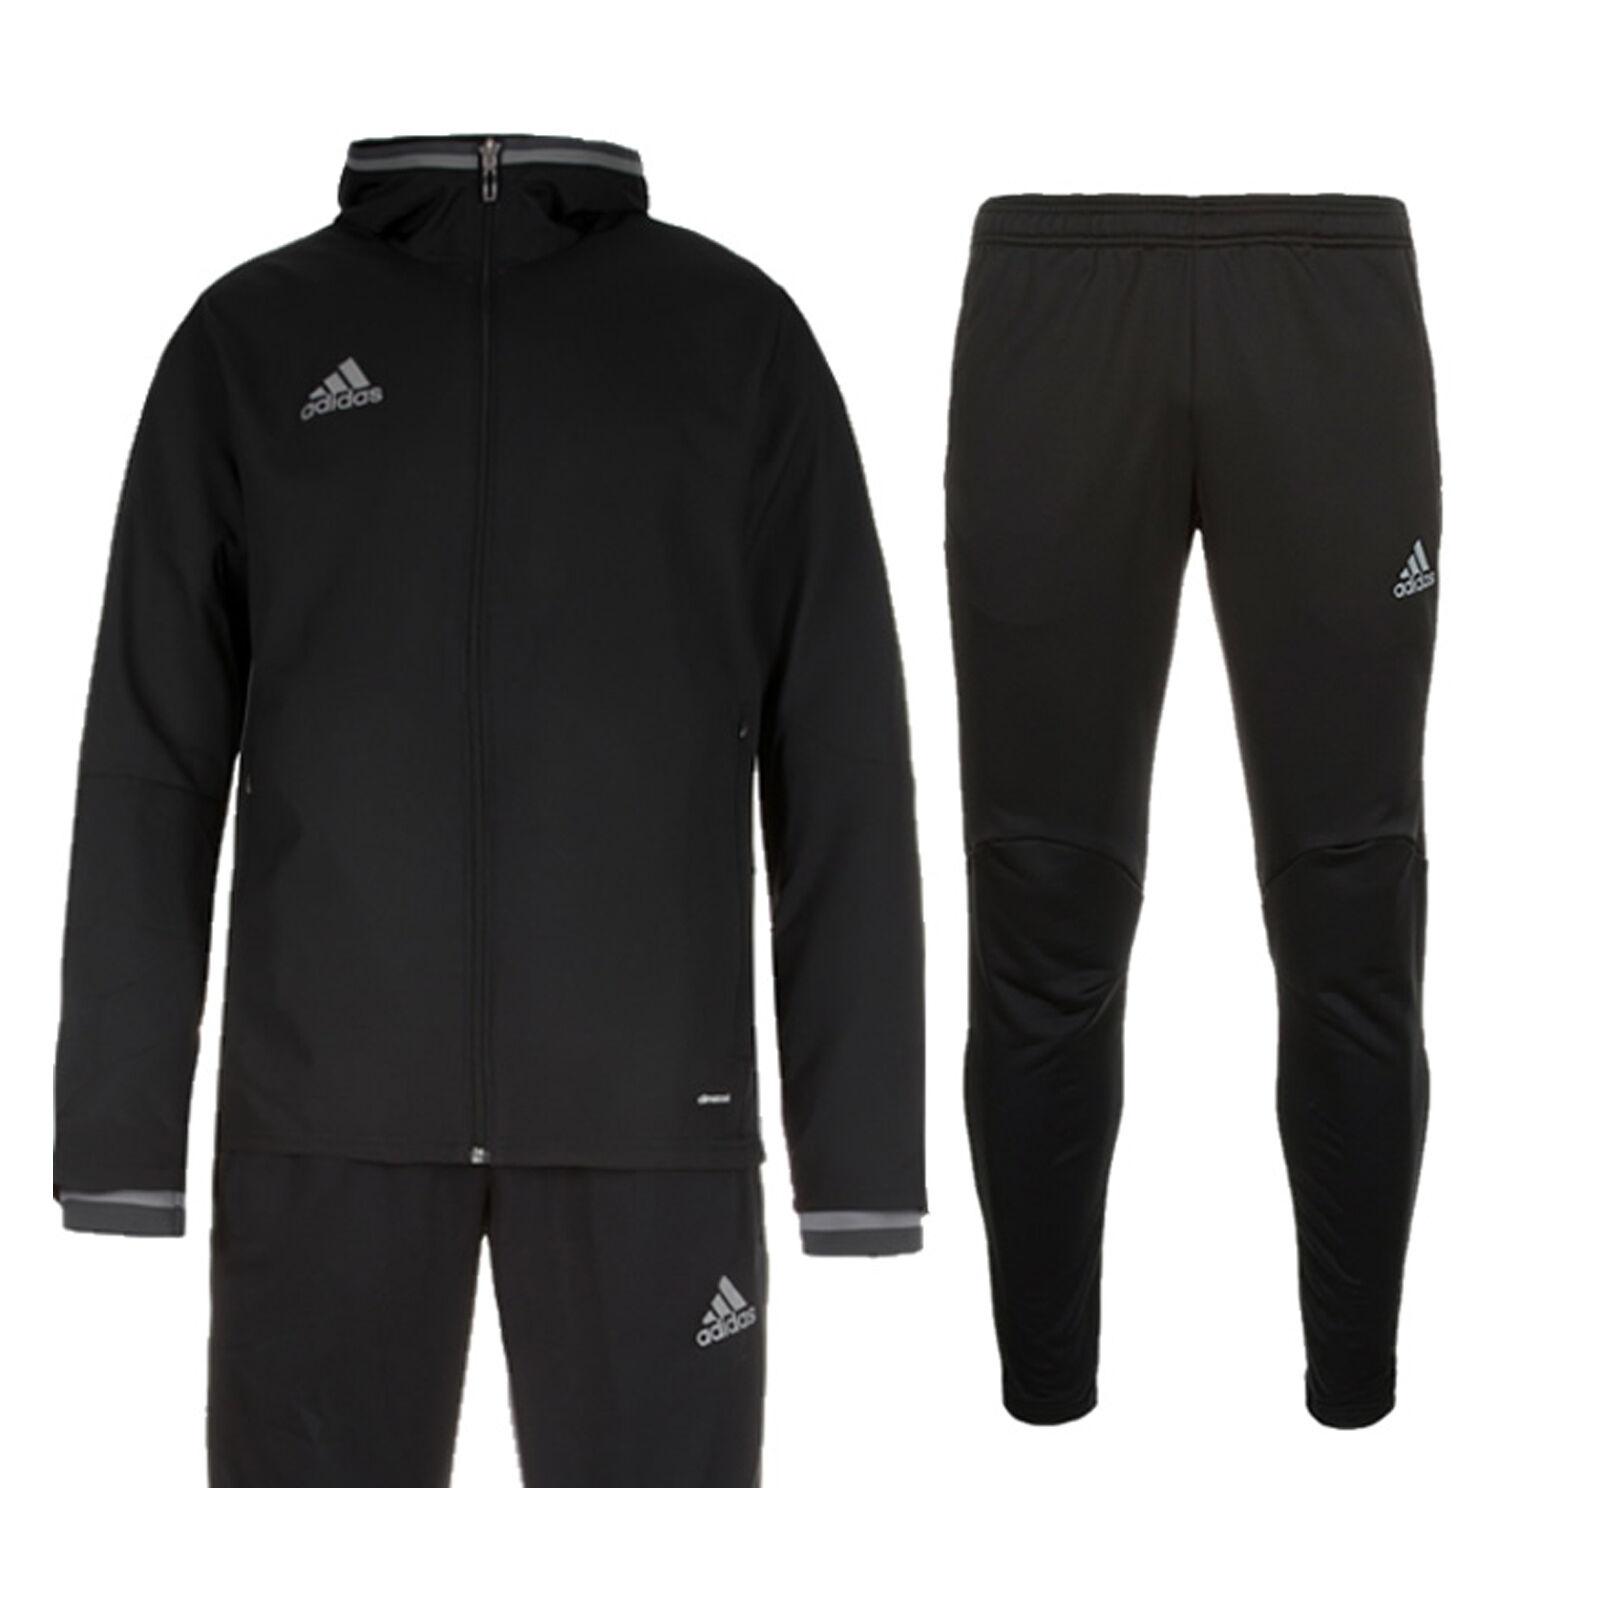 5074842e515 Adidas Condivo 16 Tracksuit Presentation Suit Kids 3 Stripe New | eBay